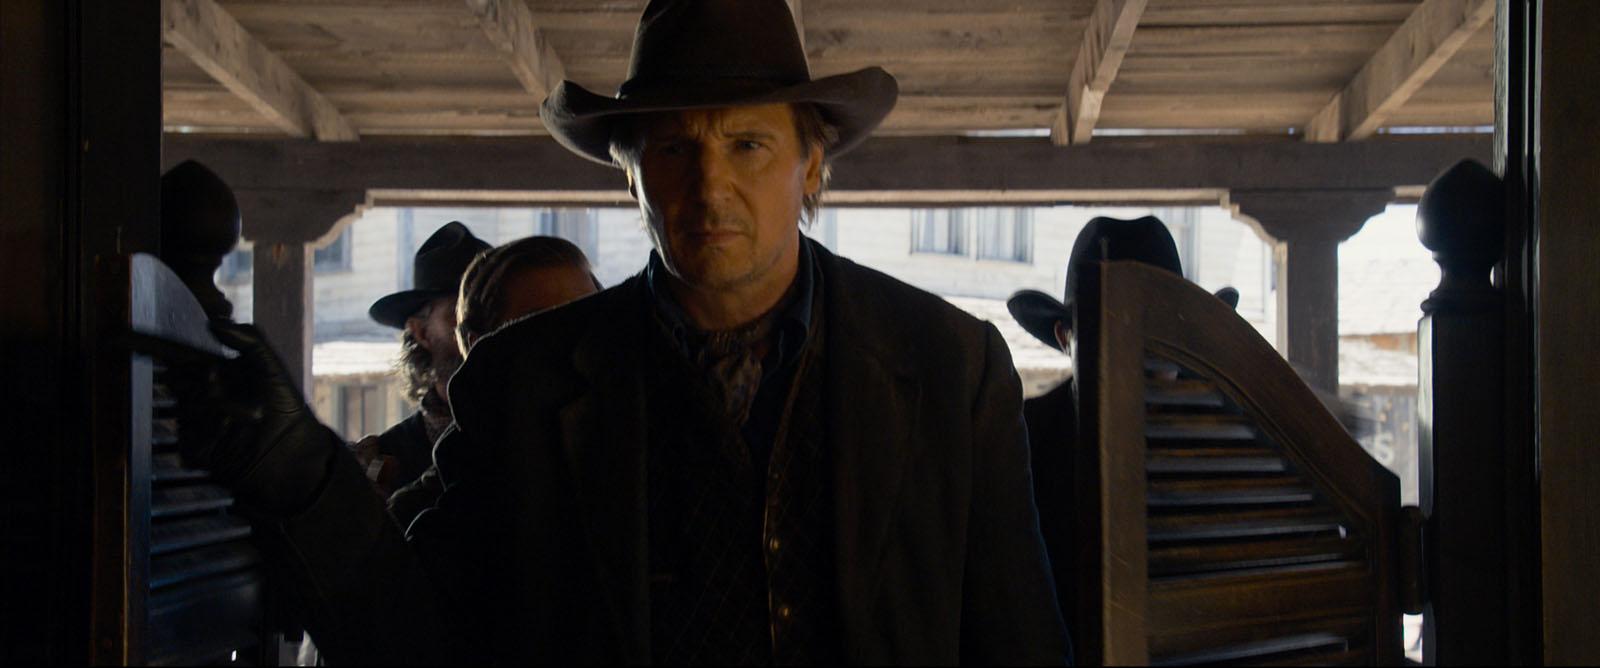 Clinch (Liam Neeson) - Albert à l'Ouest